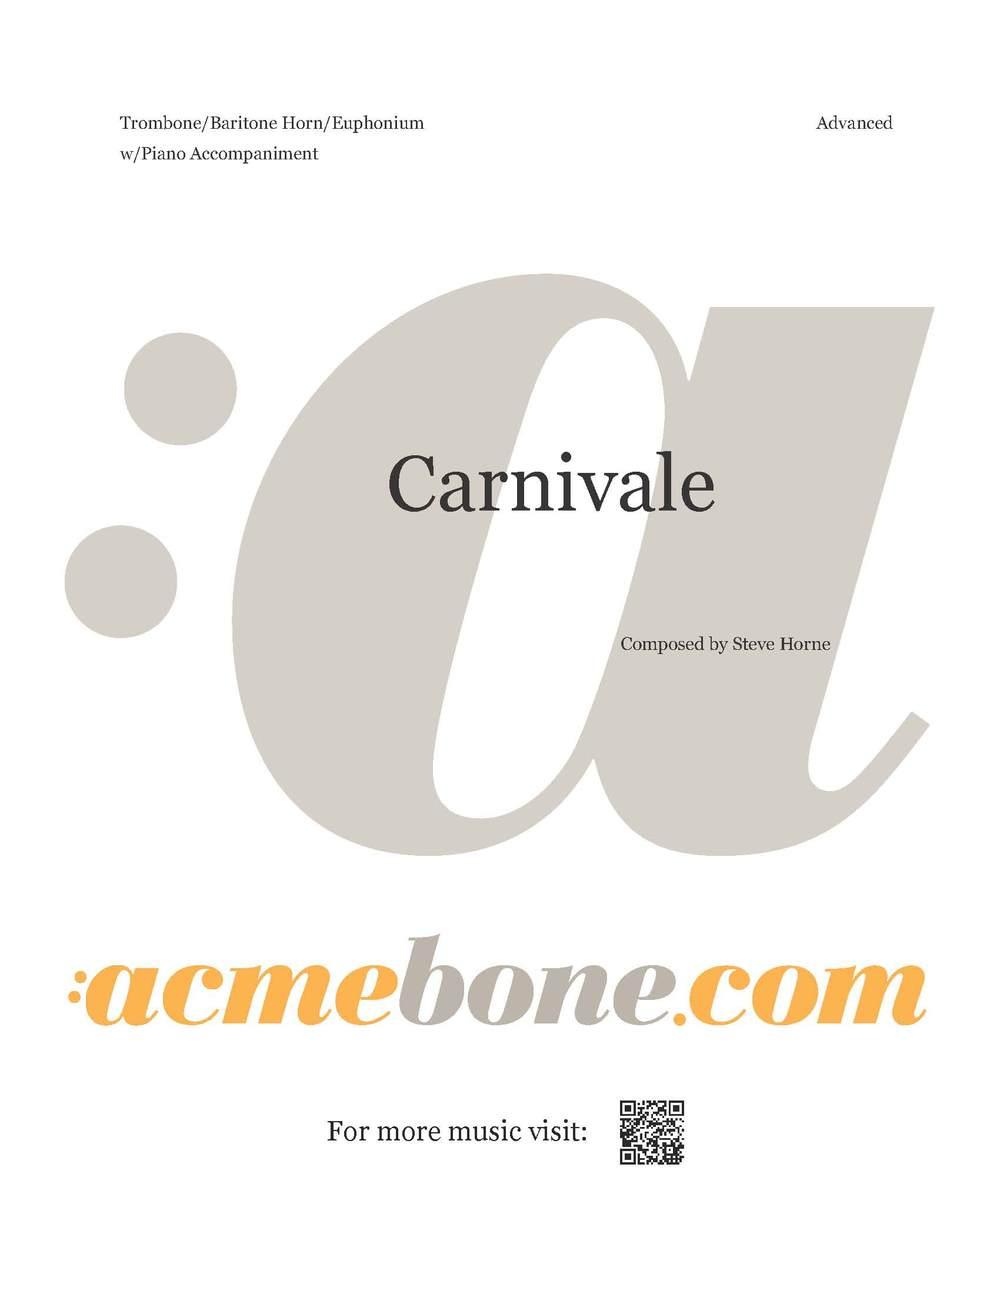 Carnivale_Page_1.jpg